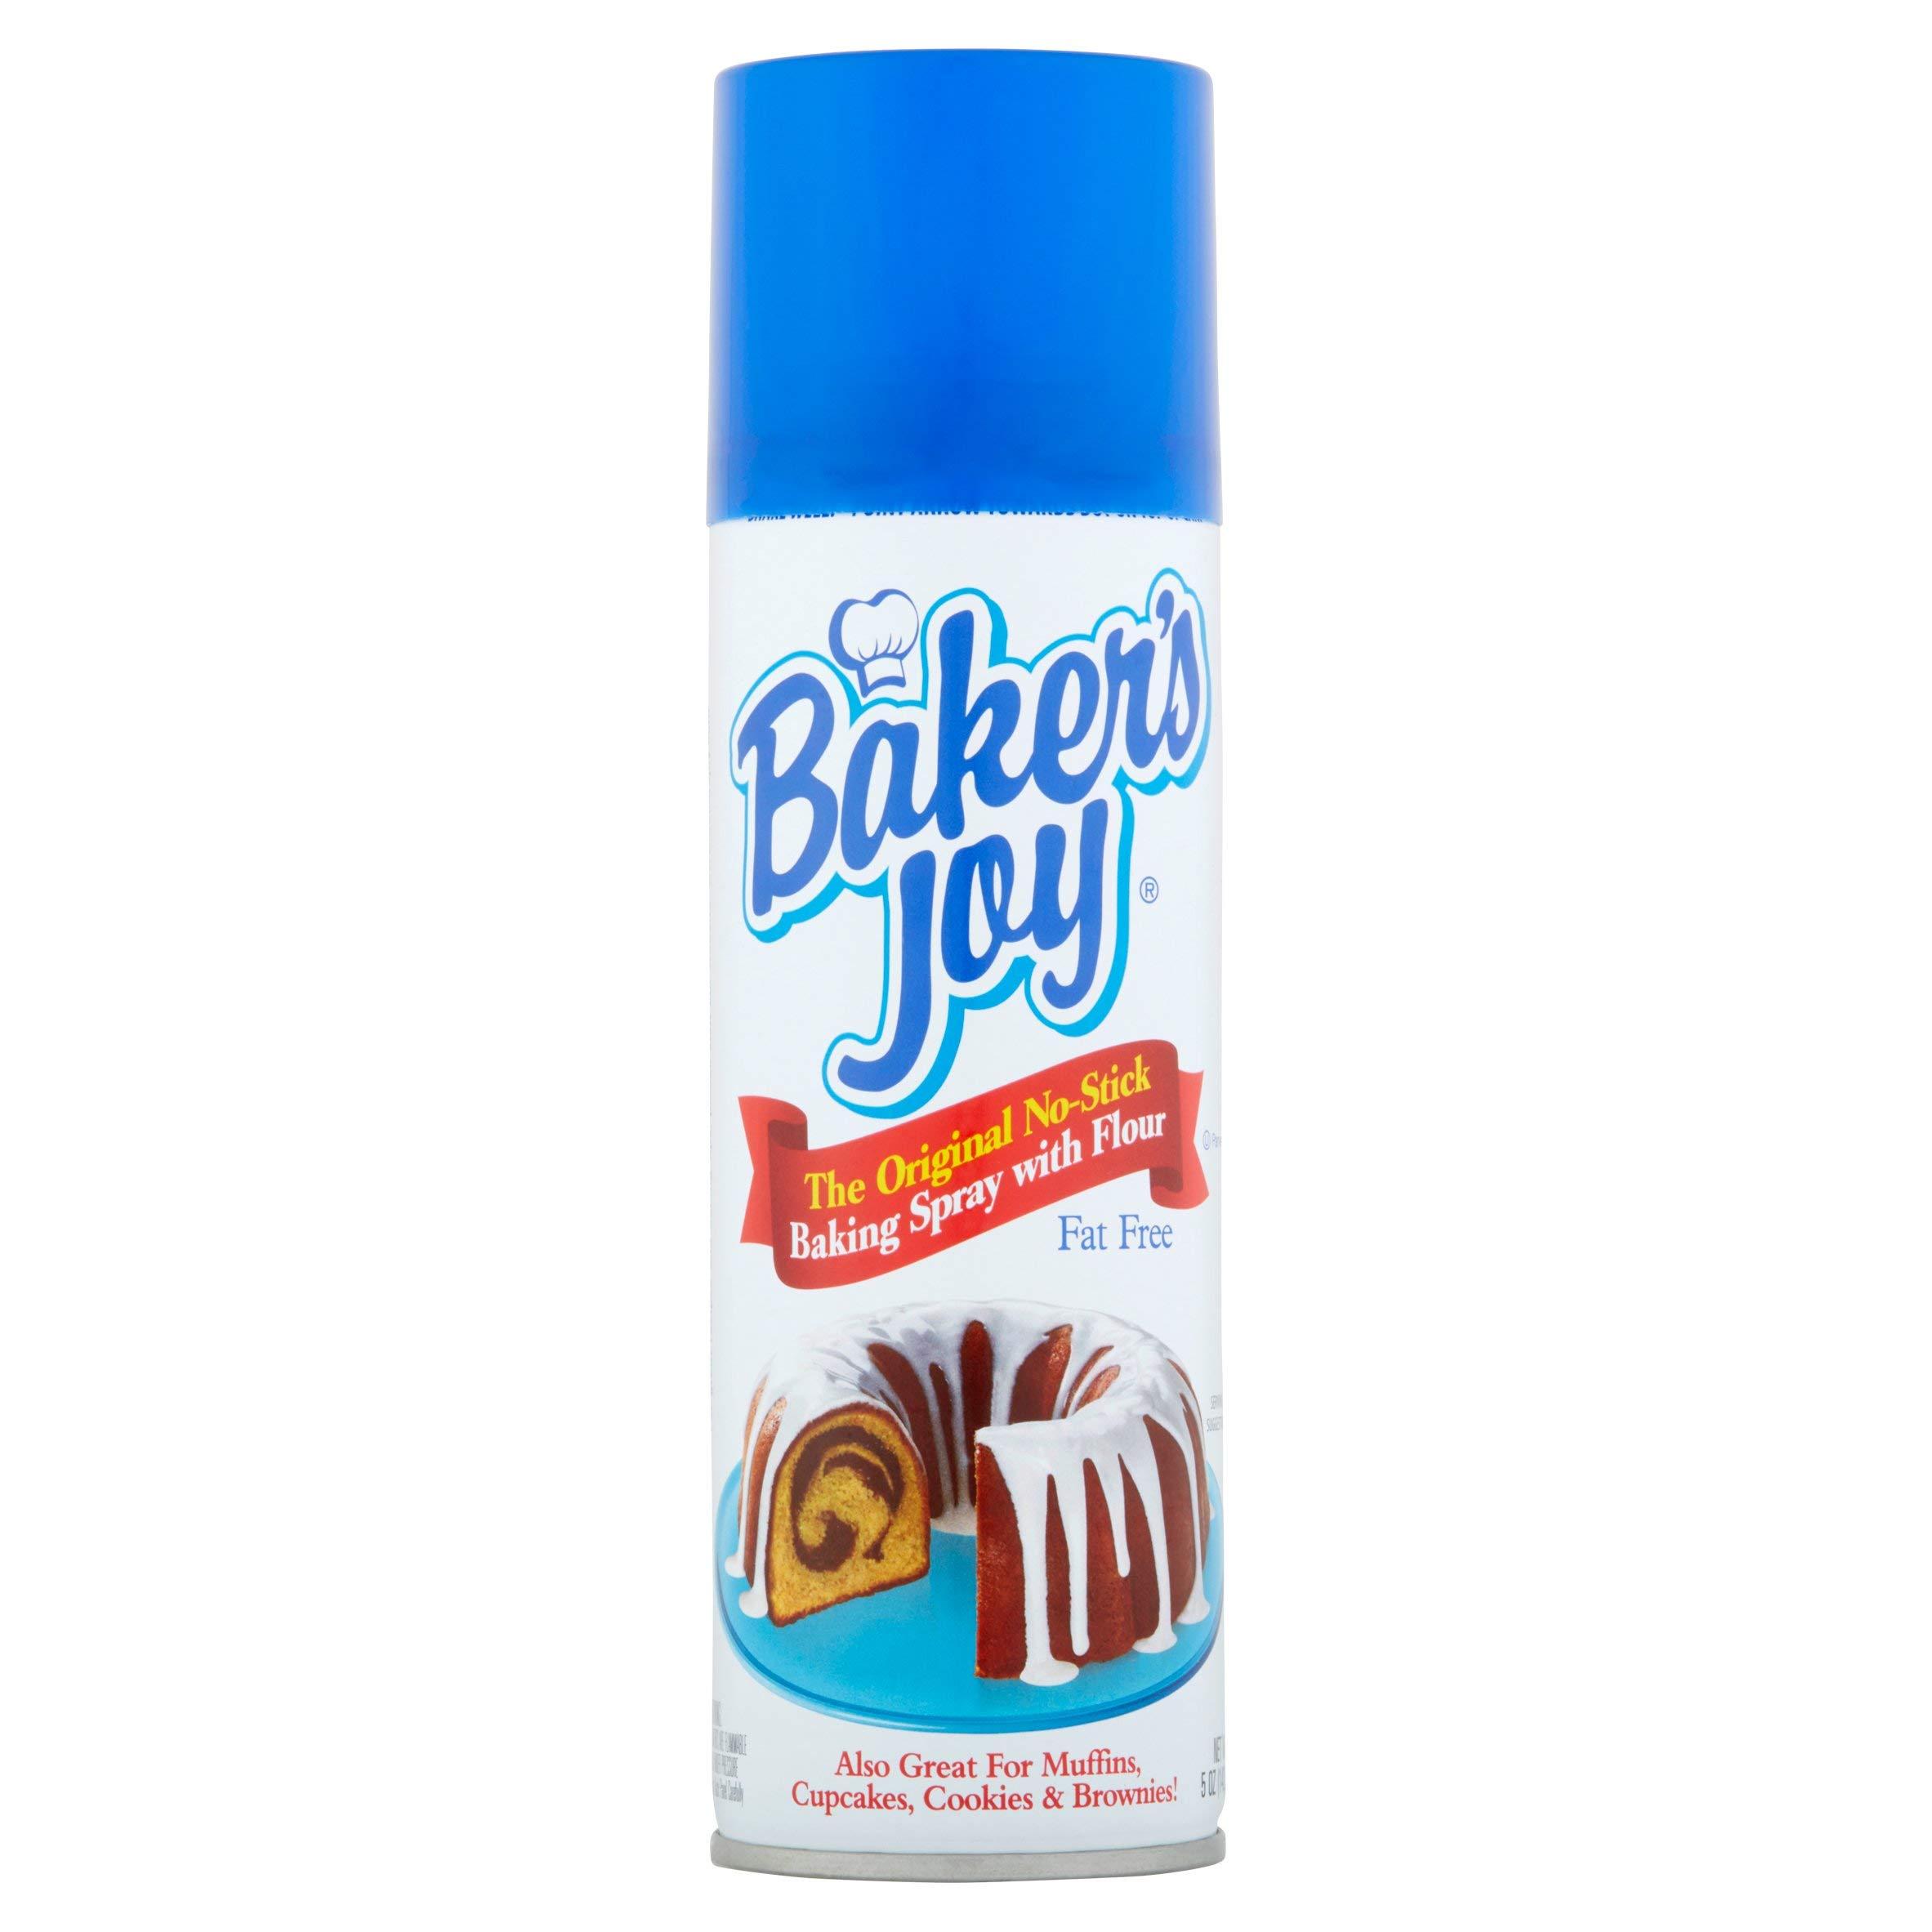 Baker's Joy The Original No-Stick Baking Spray with Flour, 5 oz (Pack of 3) by Baker's Joy